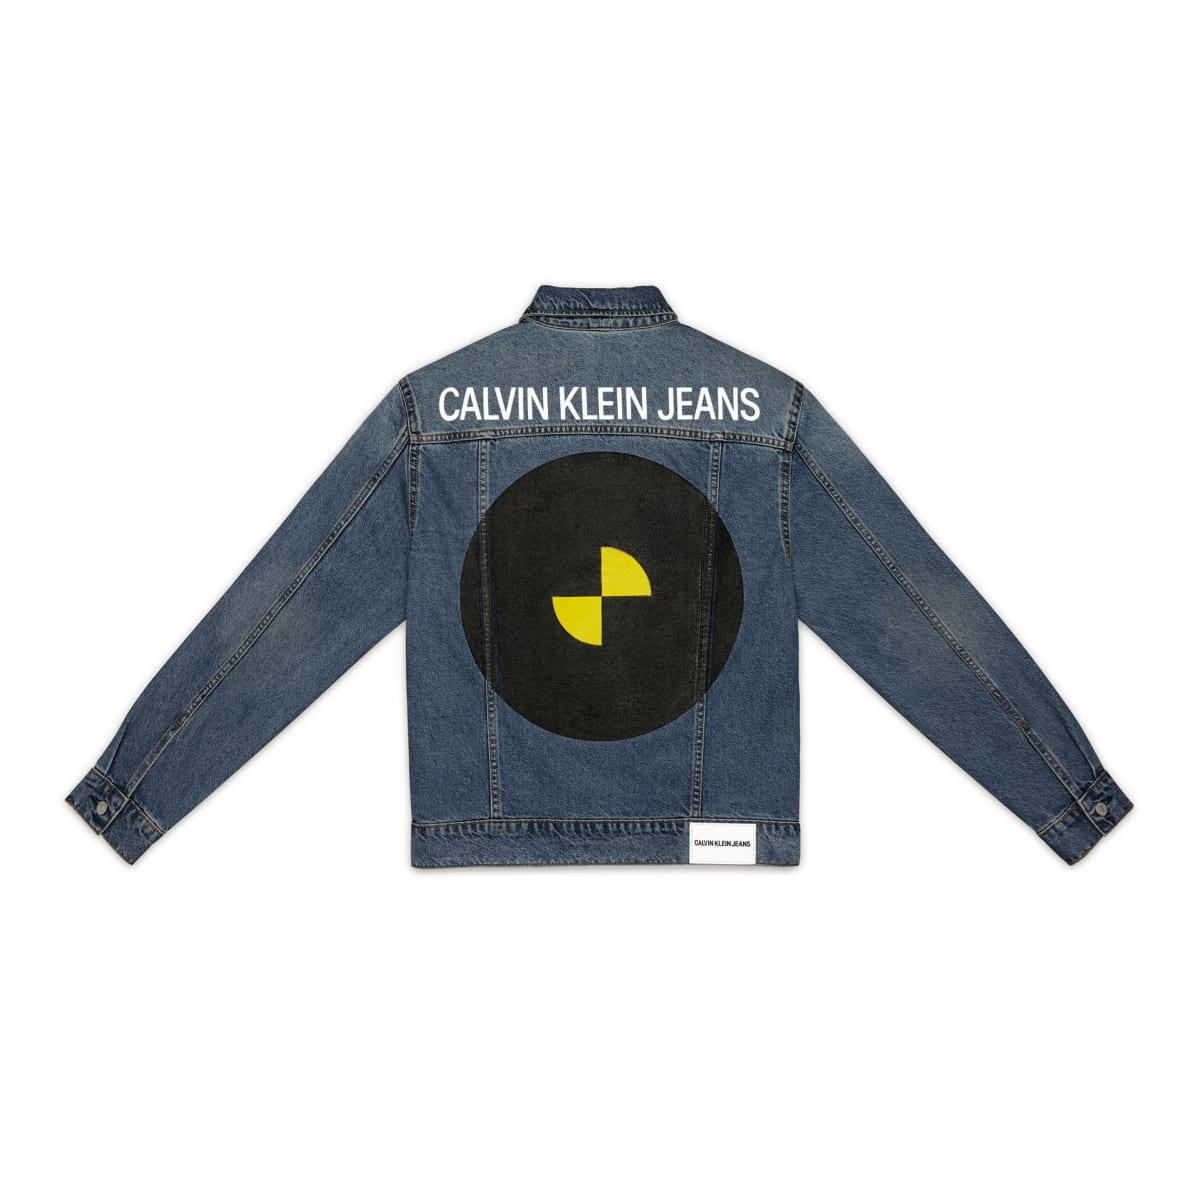 777bc74b50cb9 Best Style Releases This Week  Calvin Klein x ASAP Rocky, Palace, Aimé Leon  Dore